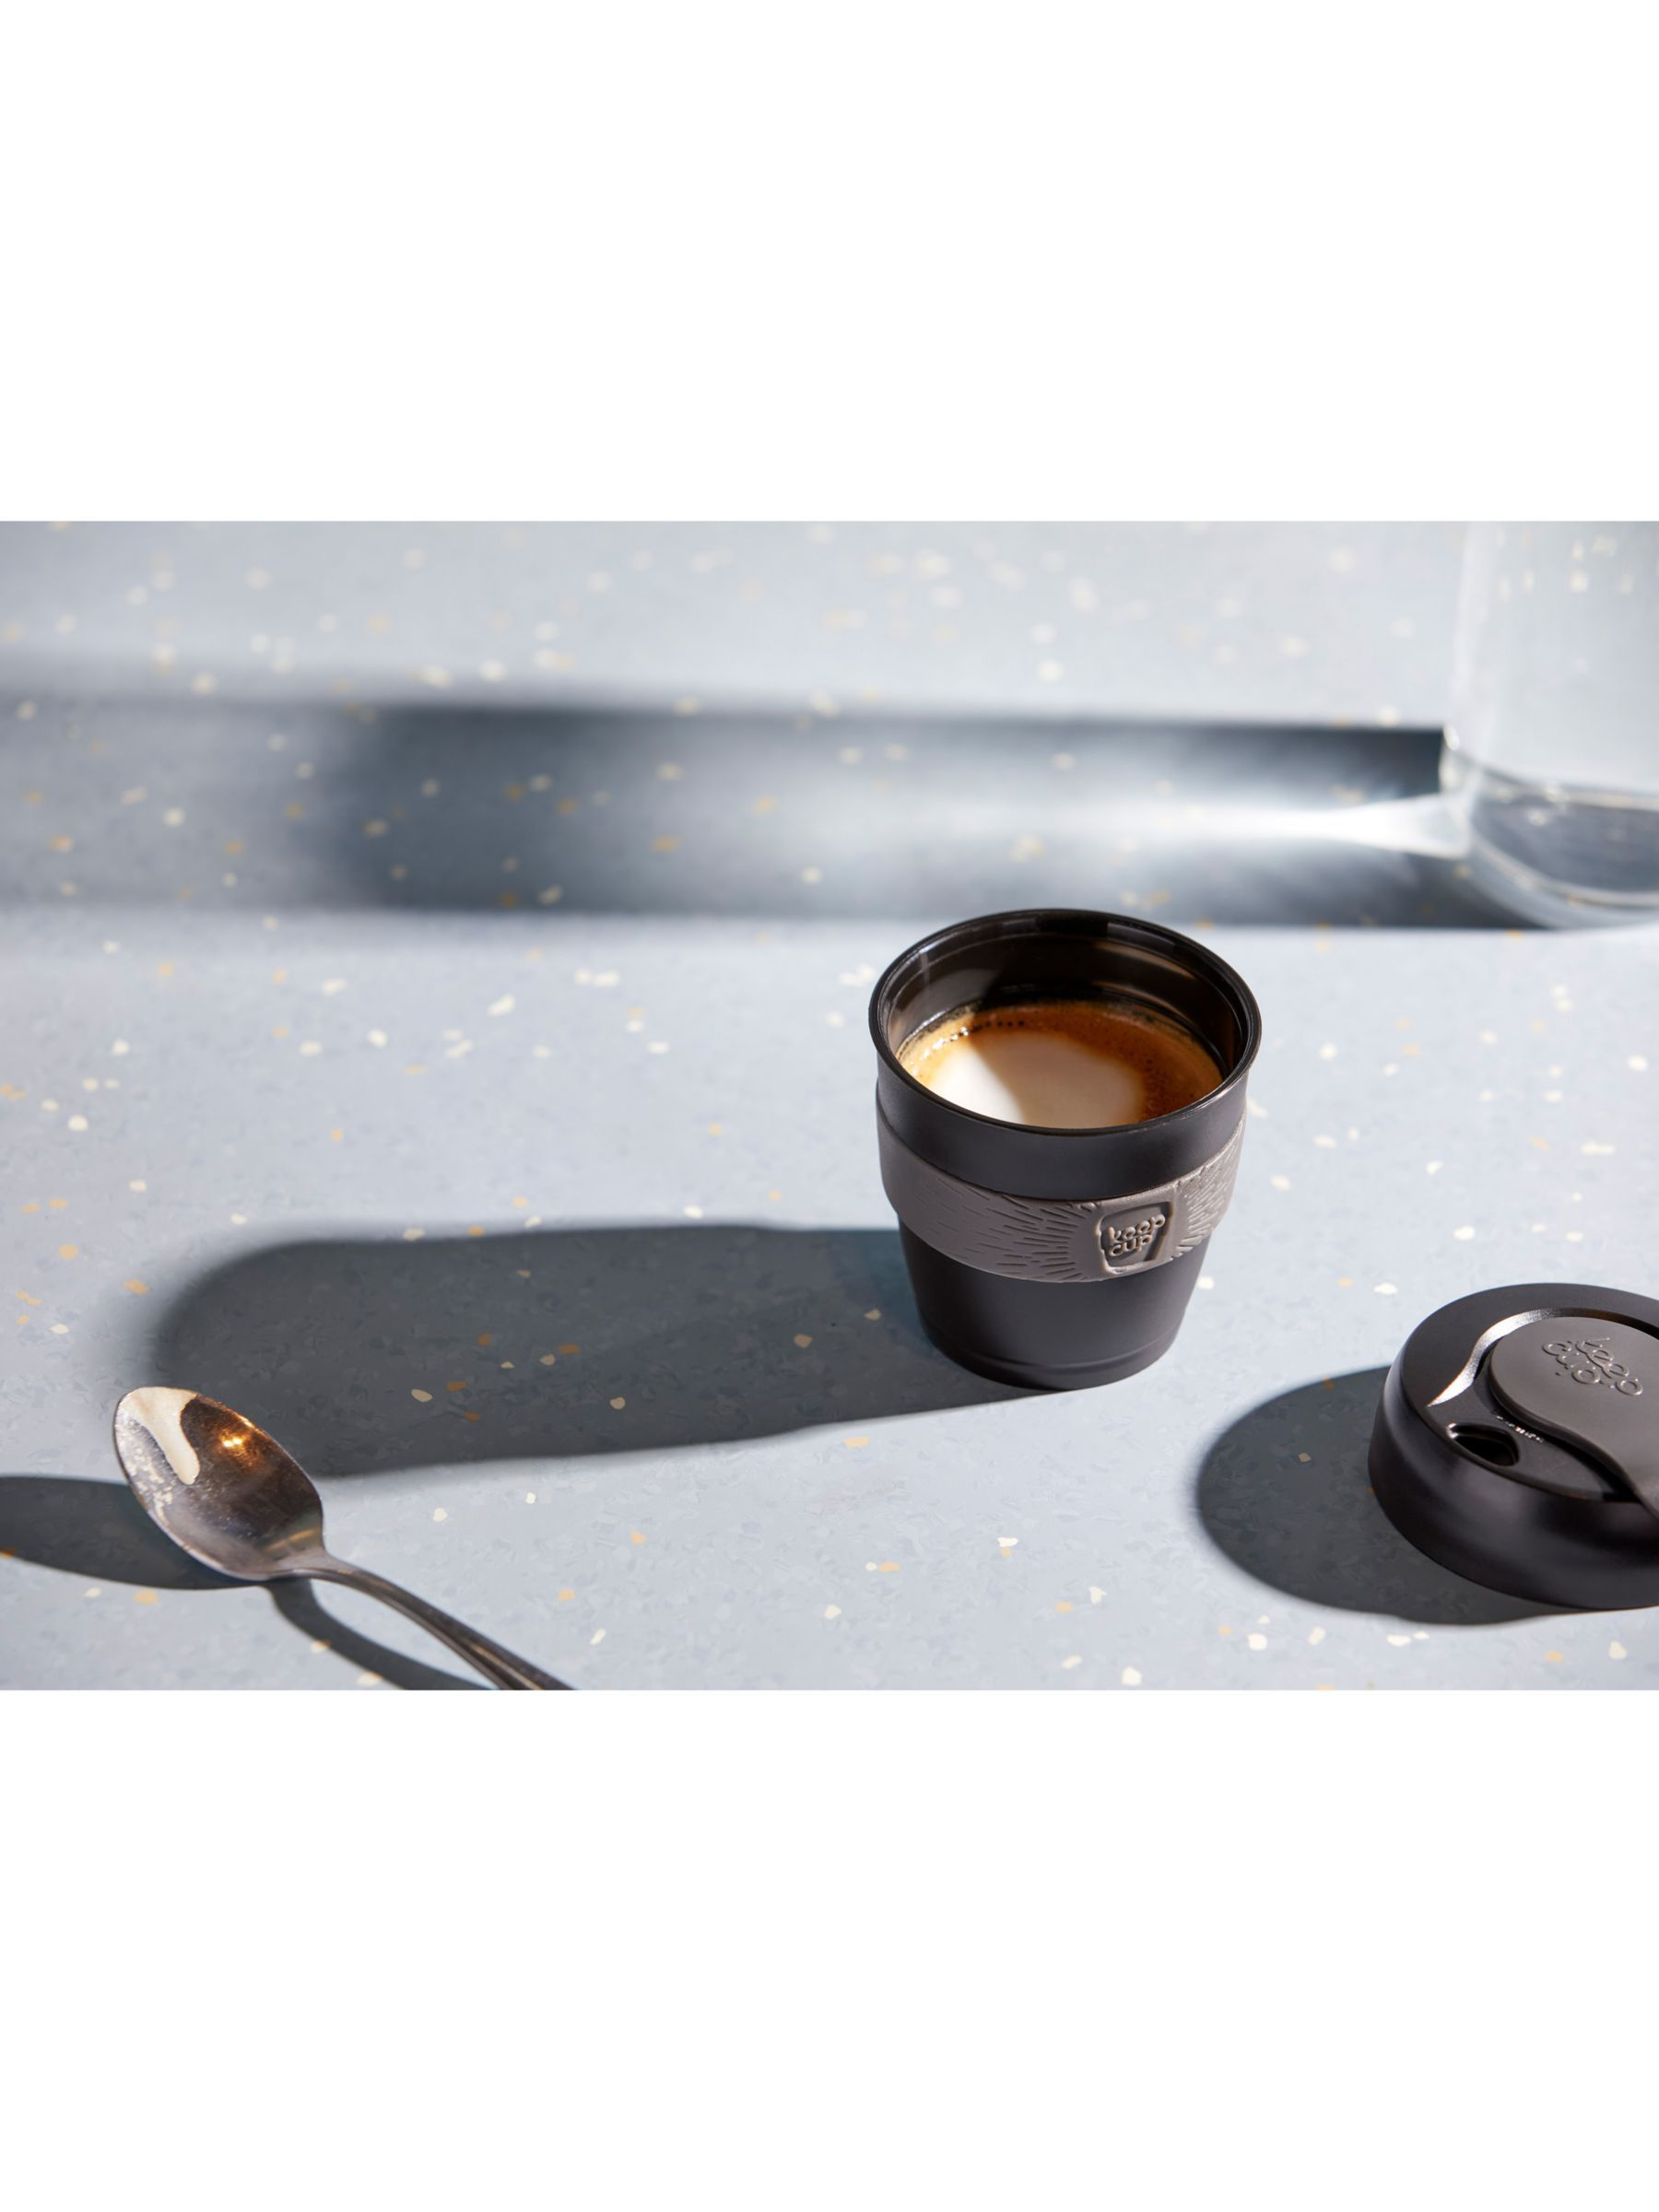 KeepCup Brew Reusable 12oz Glass Coffee Cup Travel Mug, 340ml, ClearBlack